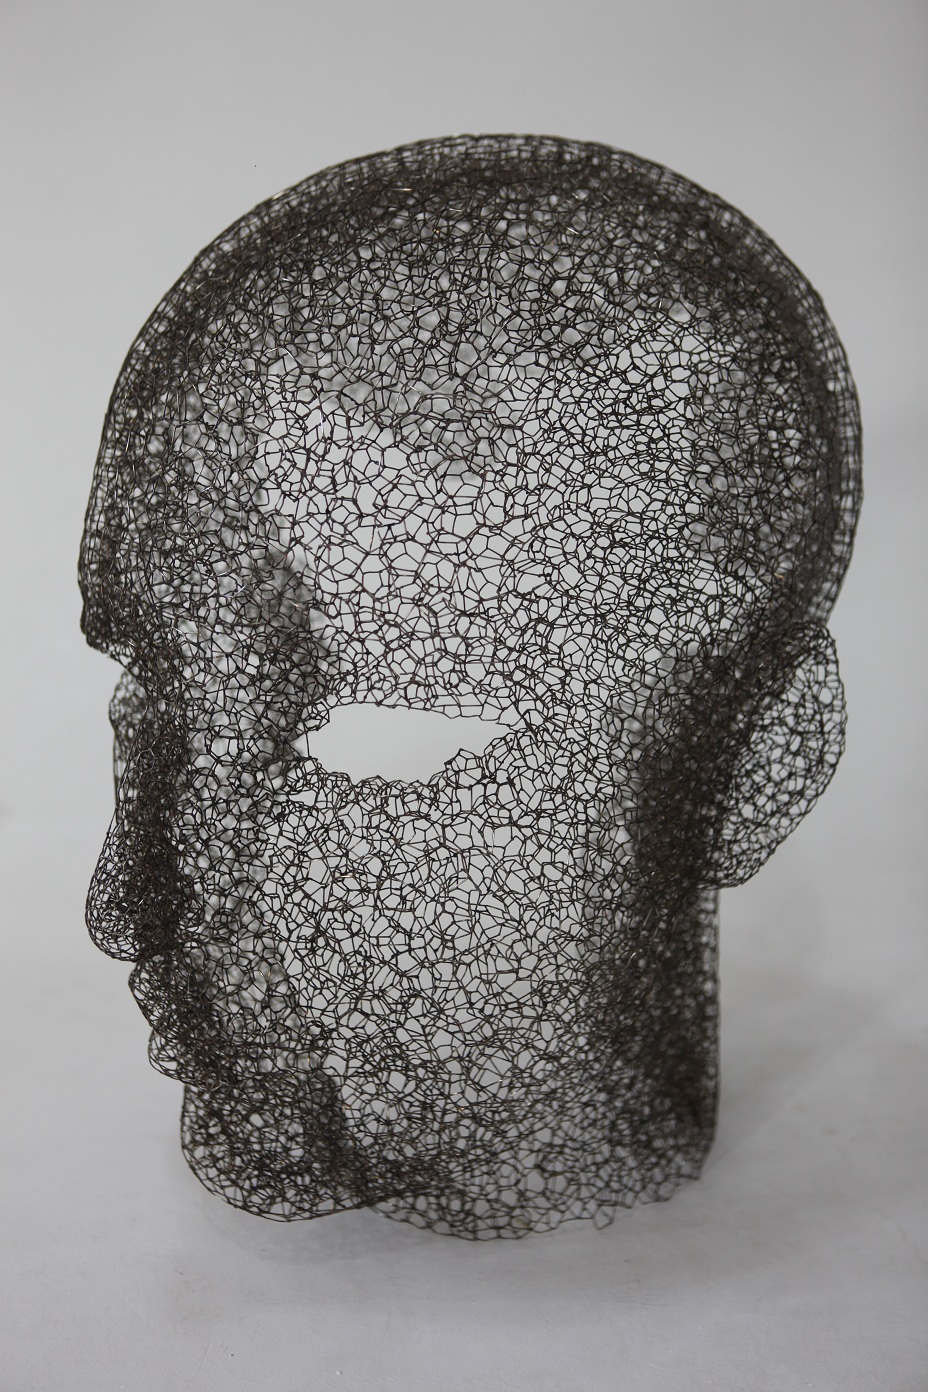 Zheng Lu 郑路, As an Instance 如我一瞬, 2013, Stainless Steel 不锈钢, 55 x 35 x 65 cm